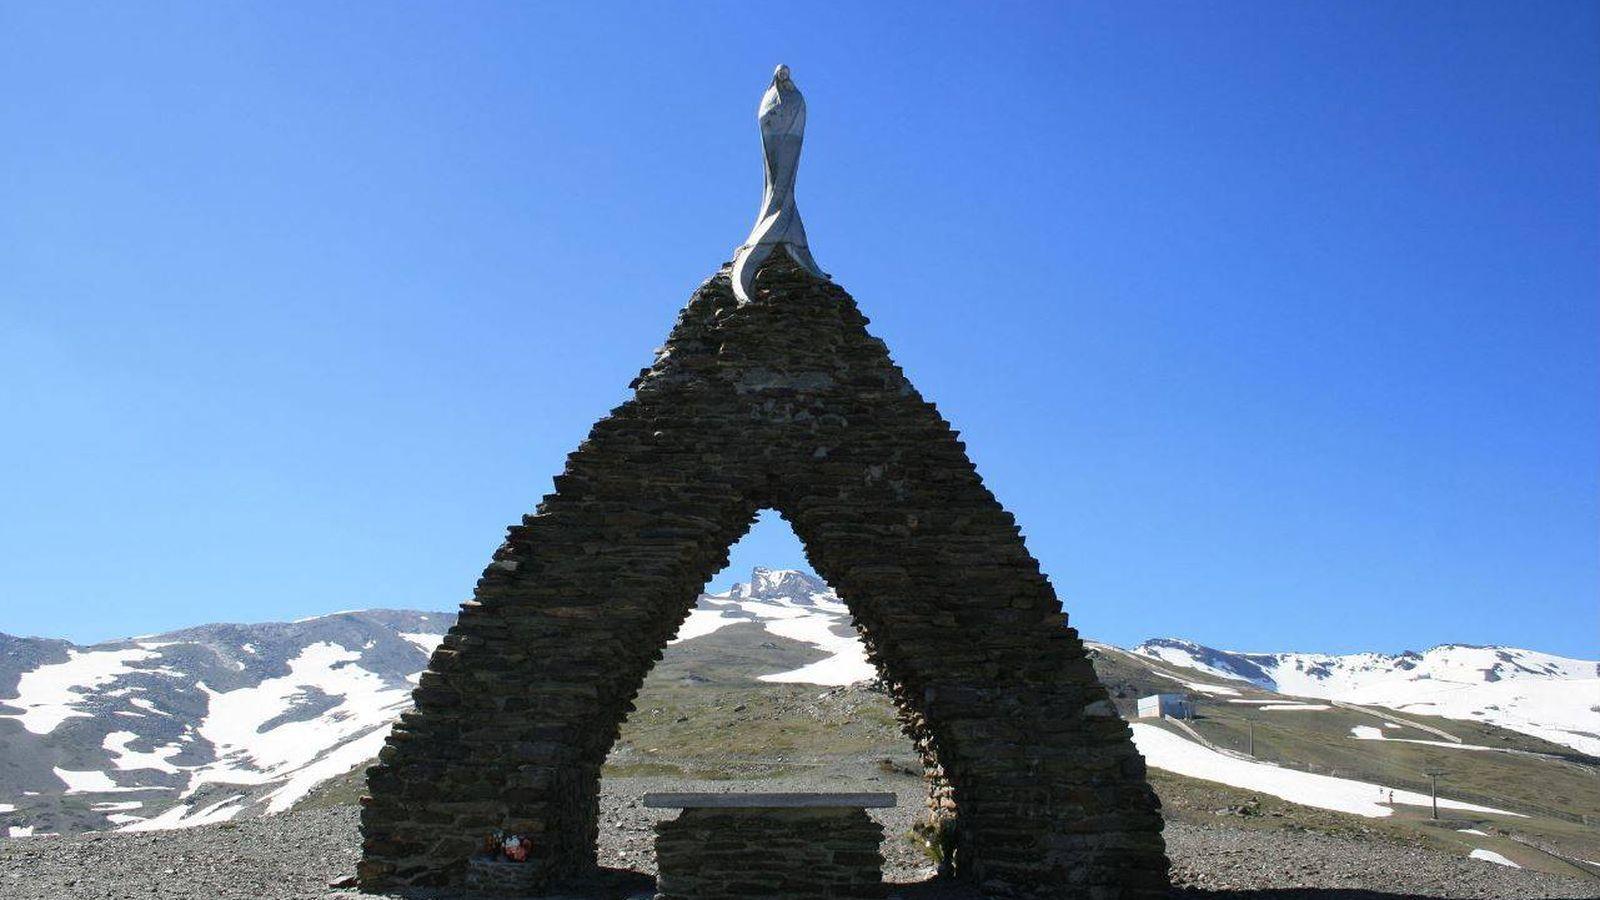 Foto: Monumento a la Virgen de las Nieves en Sierra Nevada (José Manuel Ferro/Wikipedia)